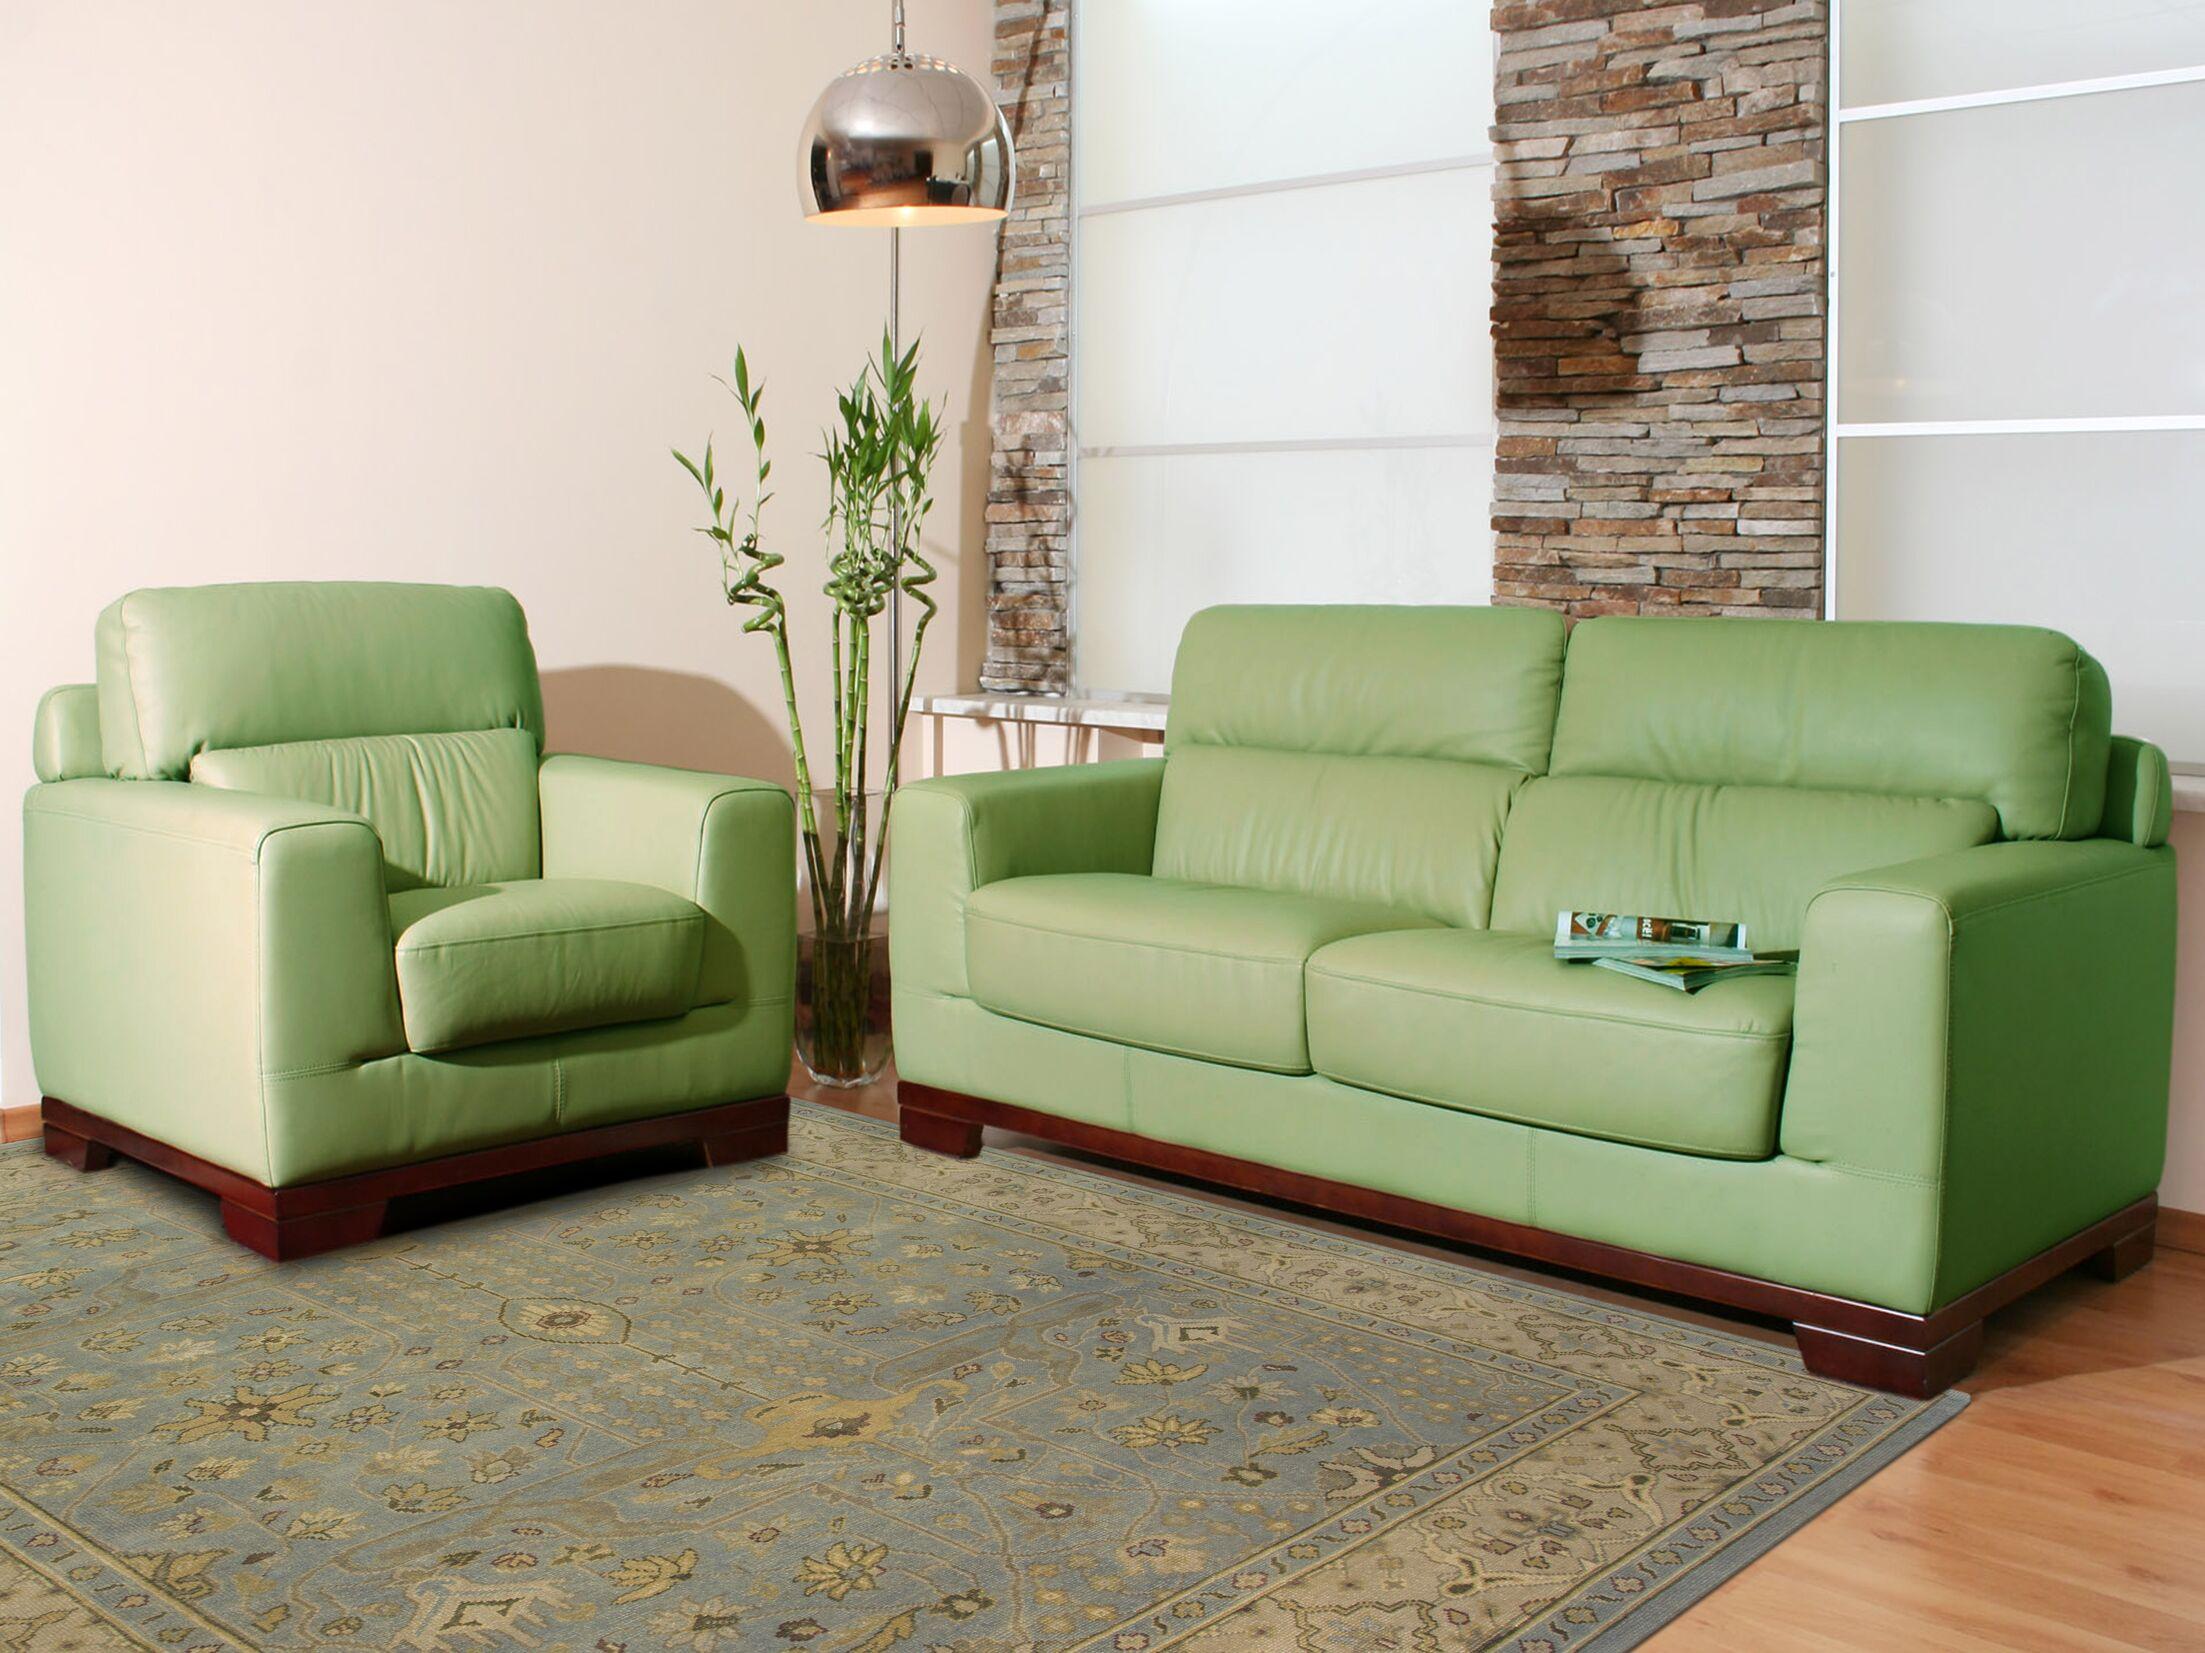 Liverpool Light Green Area Rug Rug Size: 10' x 14'